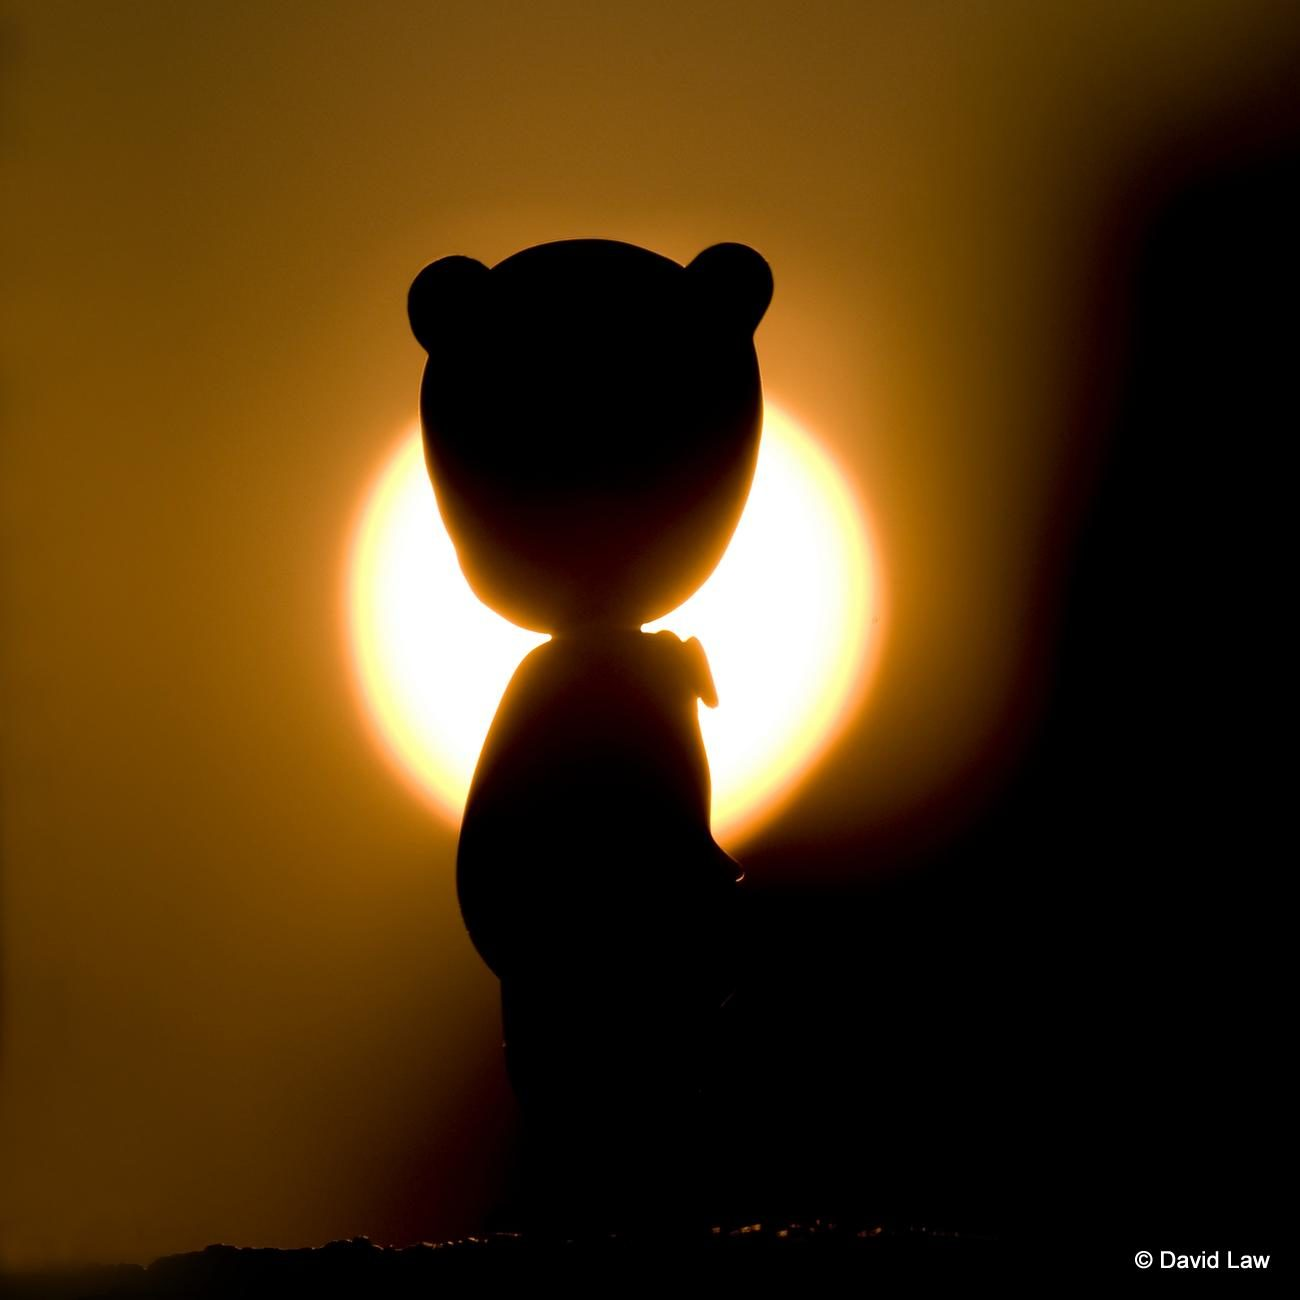 Sunset AngelsSquare